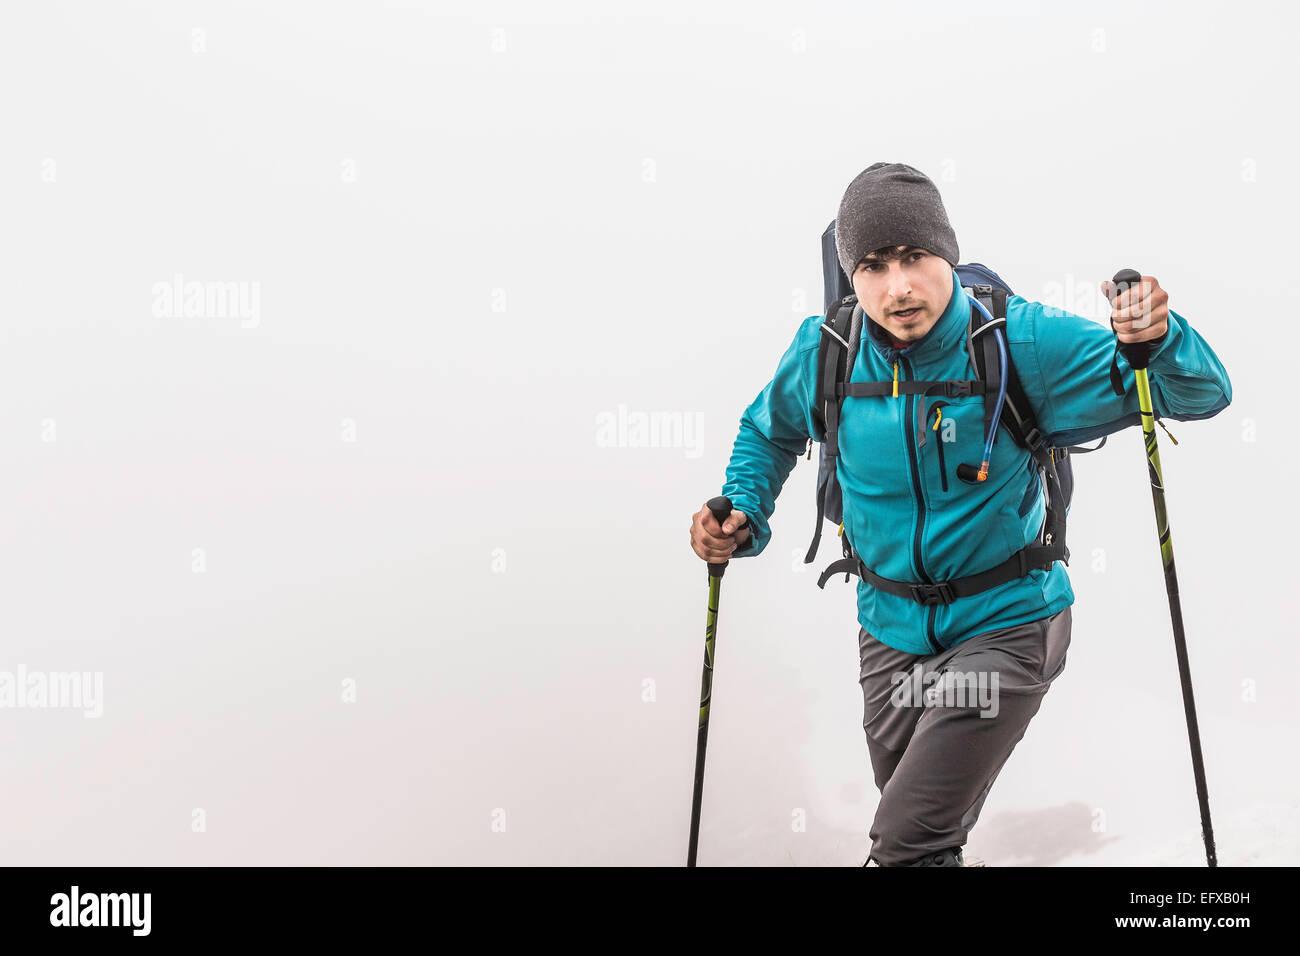 Junger Mann, Mountainbike, Wandern im Nebel, Allgäu, Oberstdorf, Bayern, Deutschland Stockbild